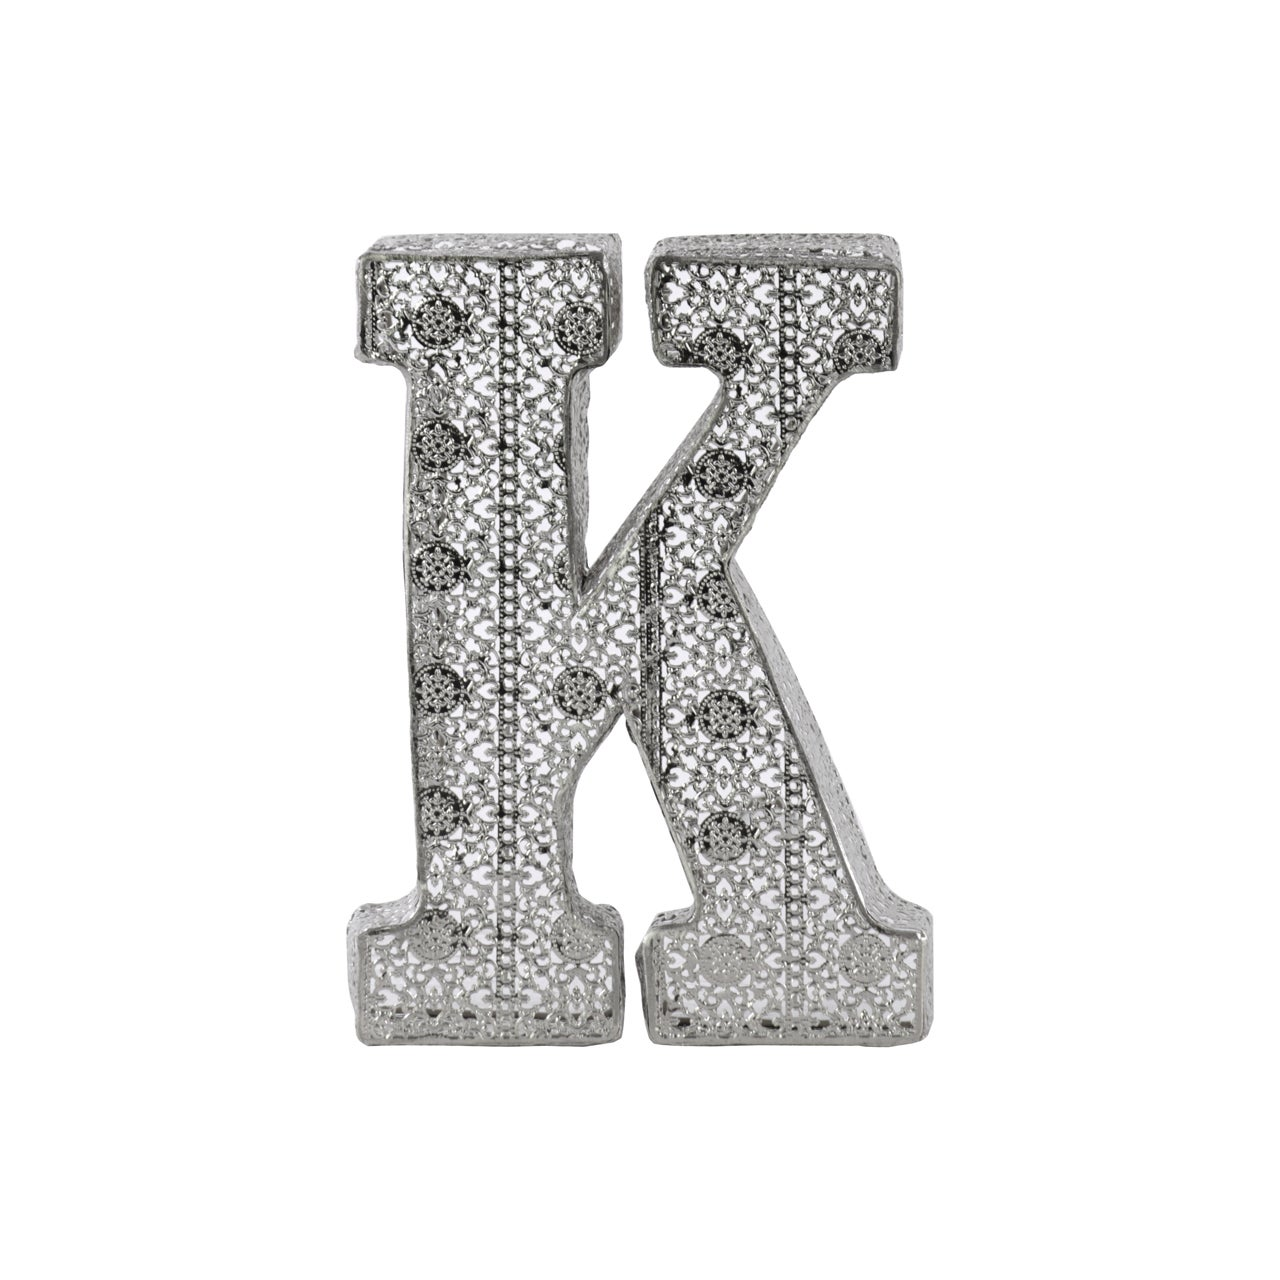 Shop Distressed Silver Metallic Finish Pierced Metal Letter K Wall